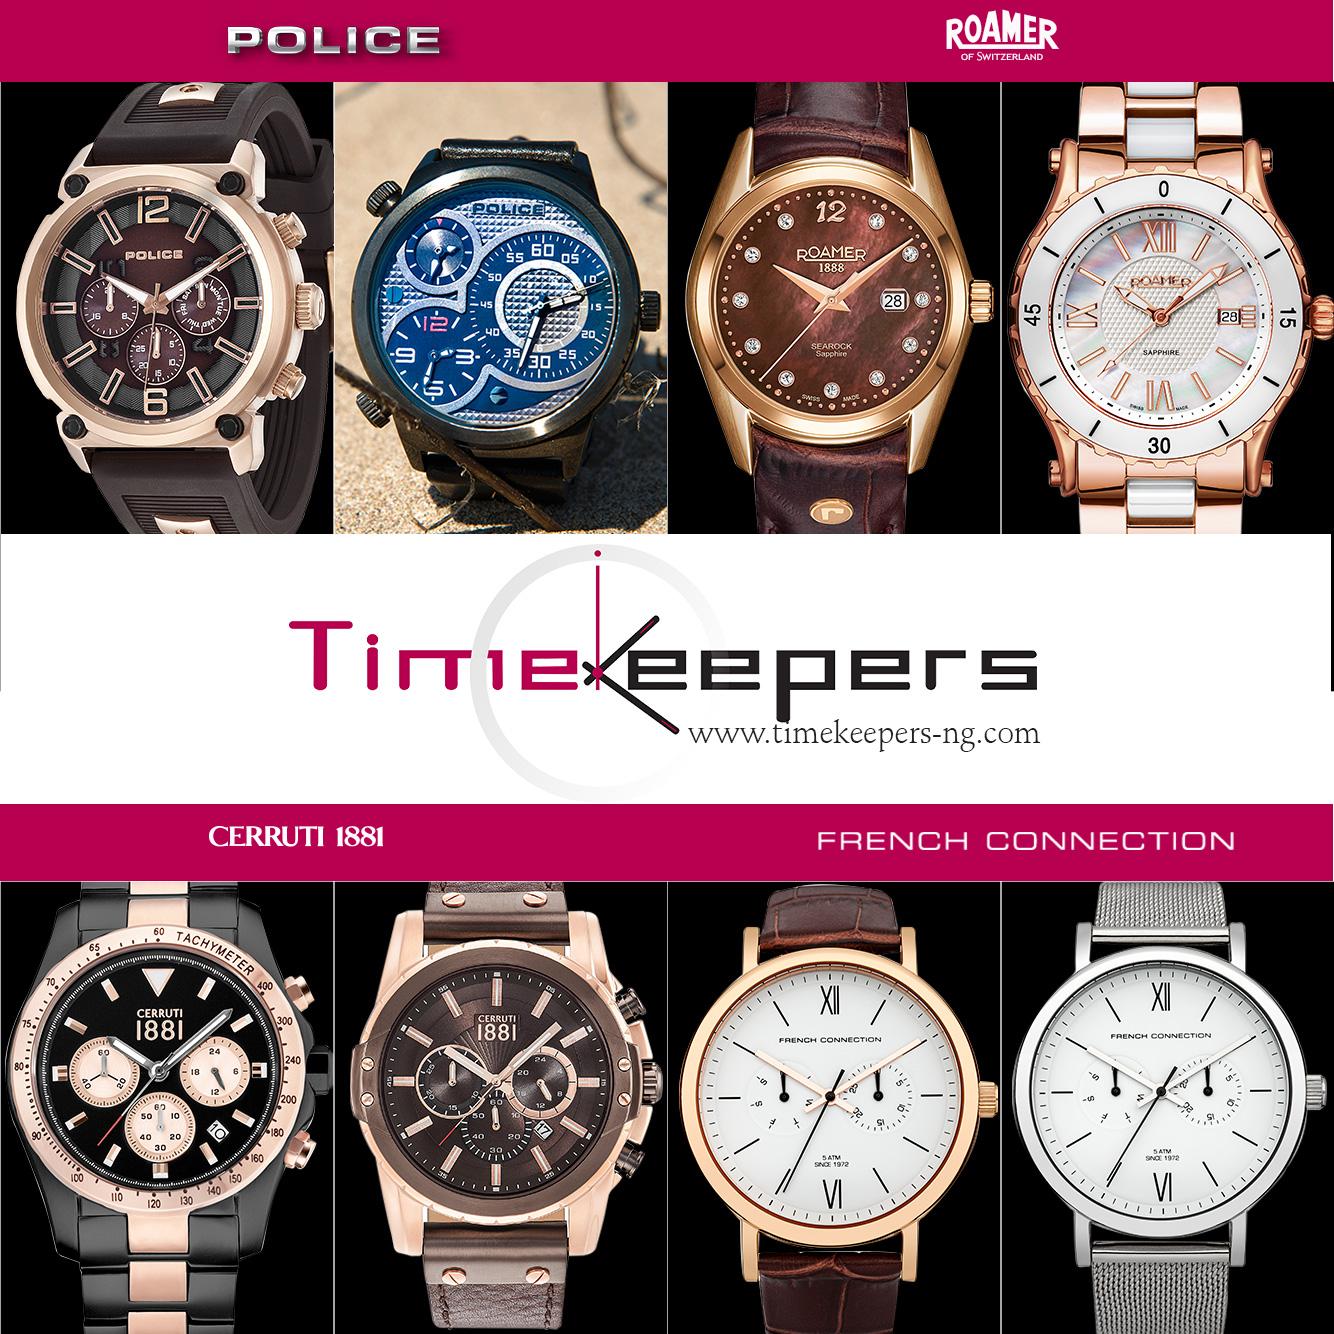 Timekeepers International Ltd